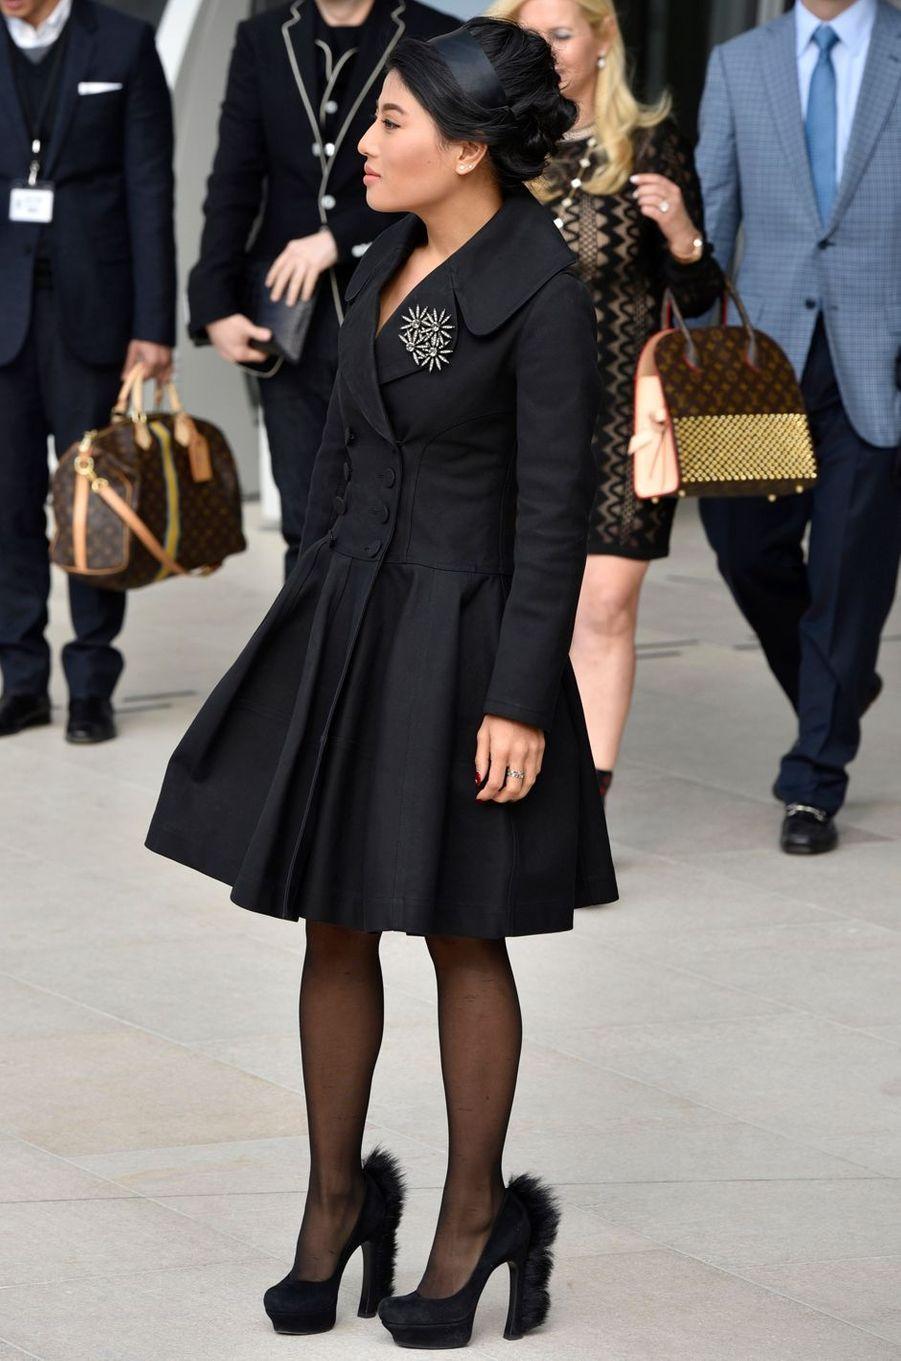 La princesse Sirivannavari Nariratana de Thaïlande à Paris, le 11 mars 2015